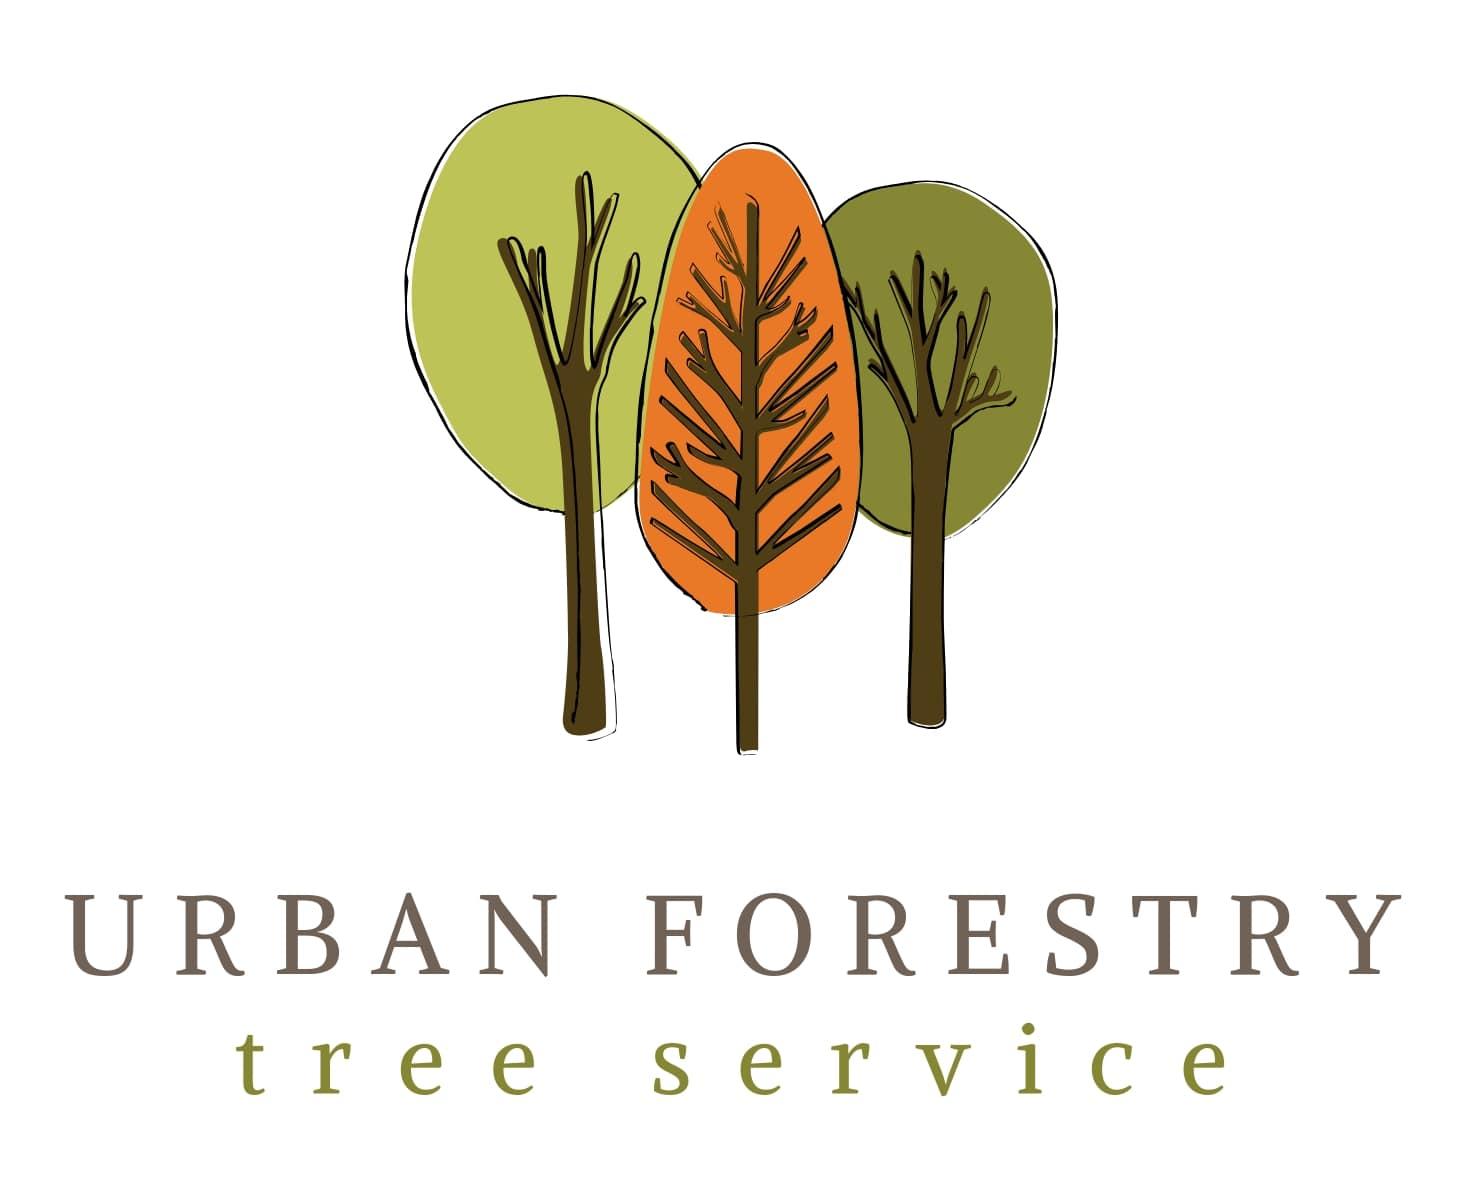 00-Urban-Forestry-Tree-Service-1.jpg